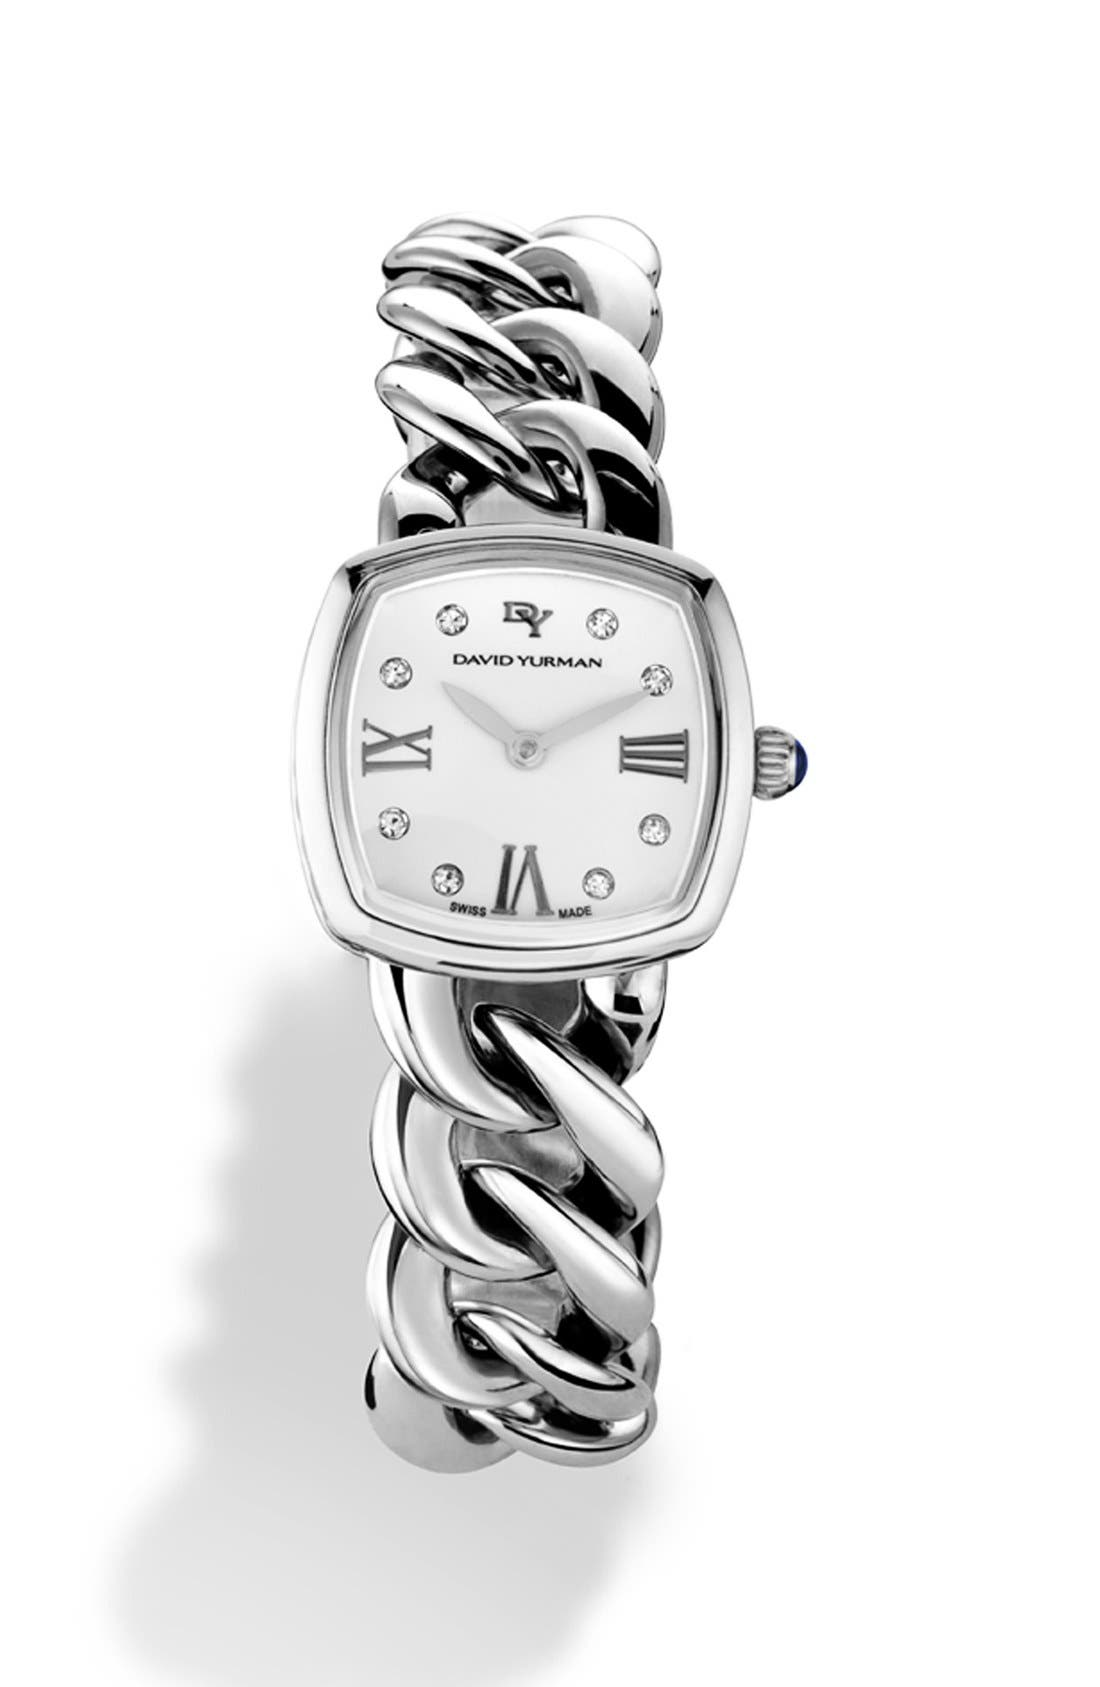 David Yurman 'Albion' 23mm Stainless Steel Quartz Watch with Diamonds